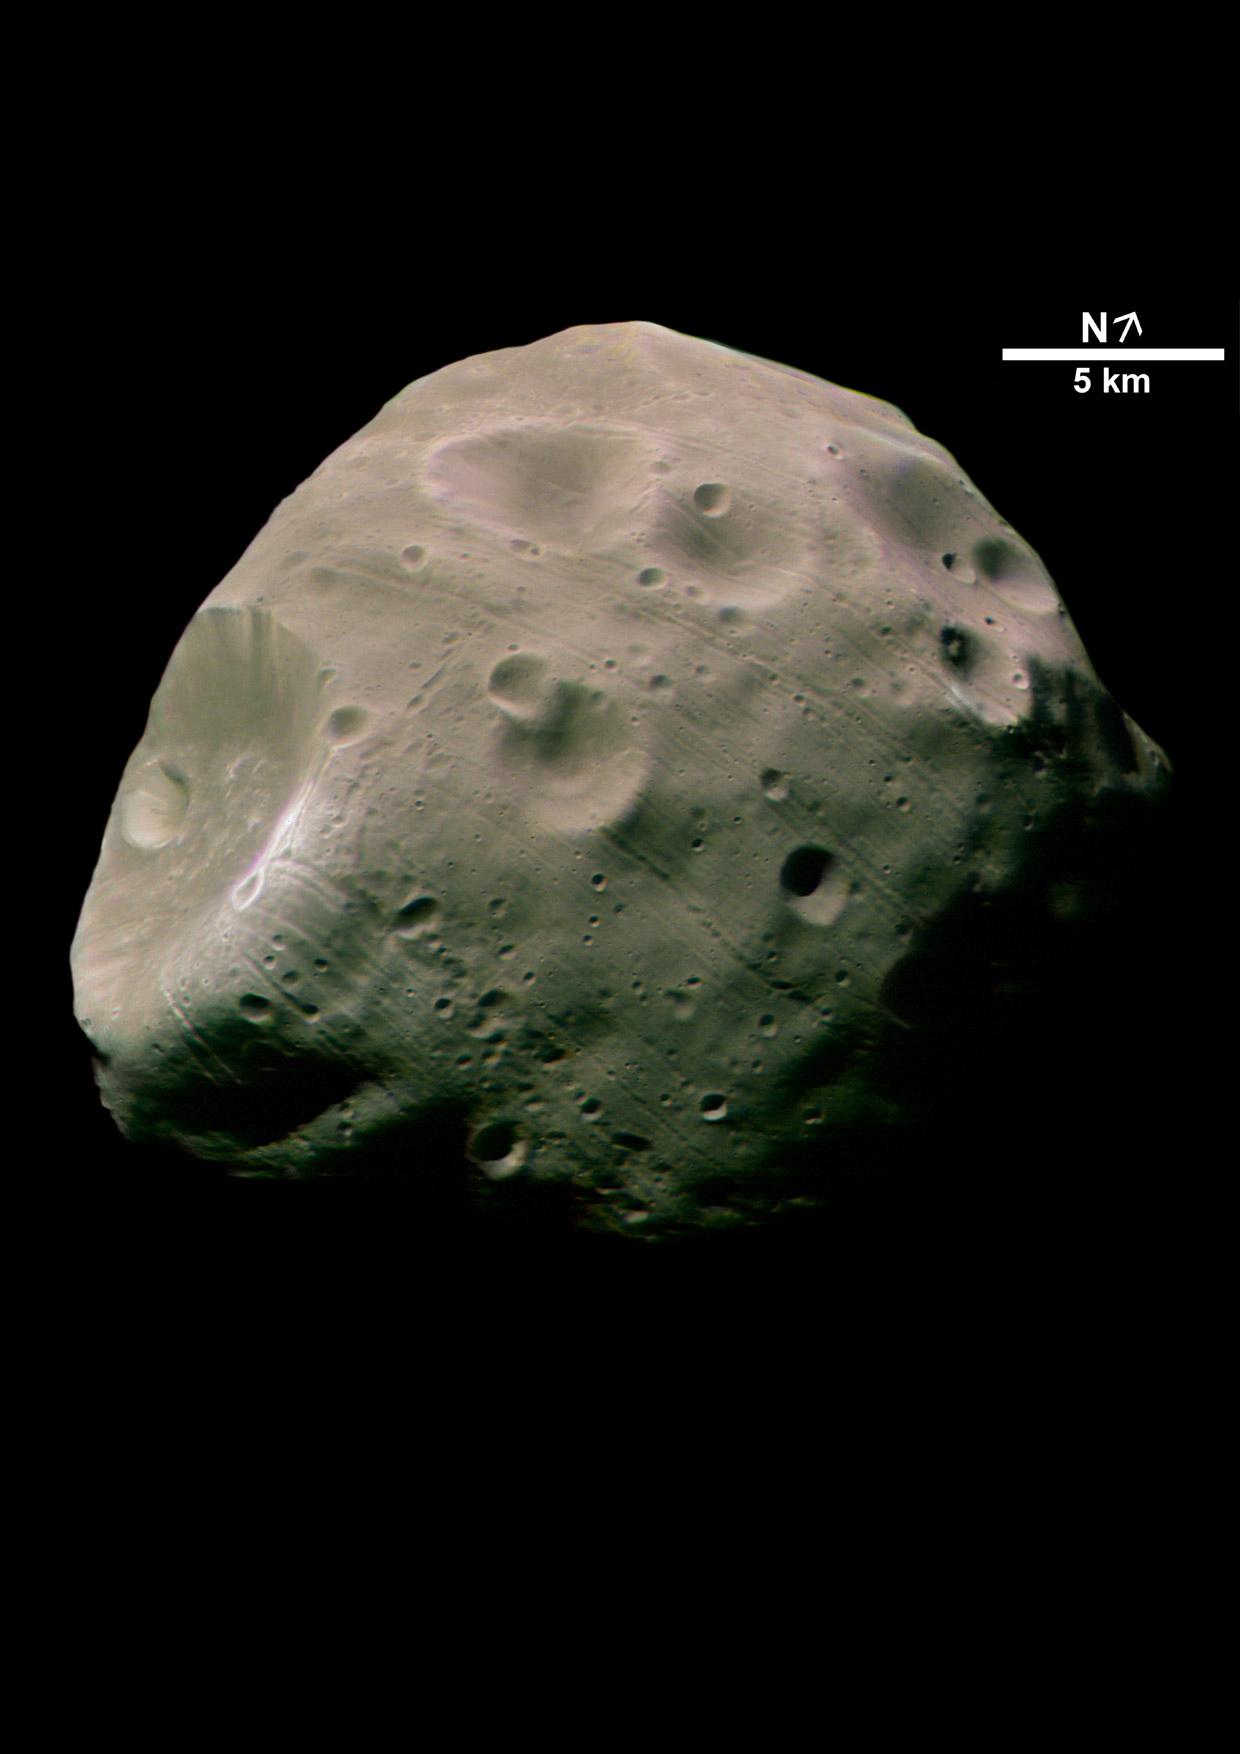 1567216841258-115-051004-0756-6-co-02-Phobos_hires.jpg